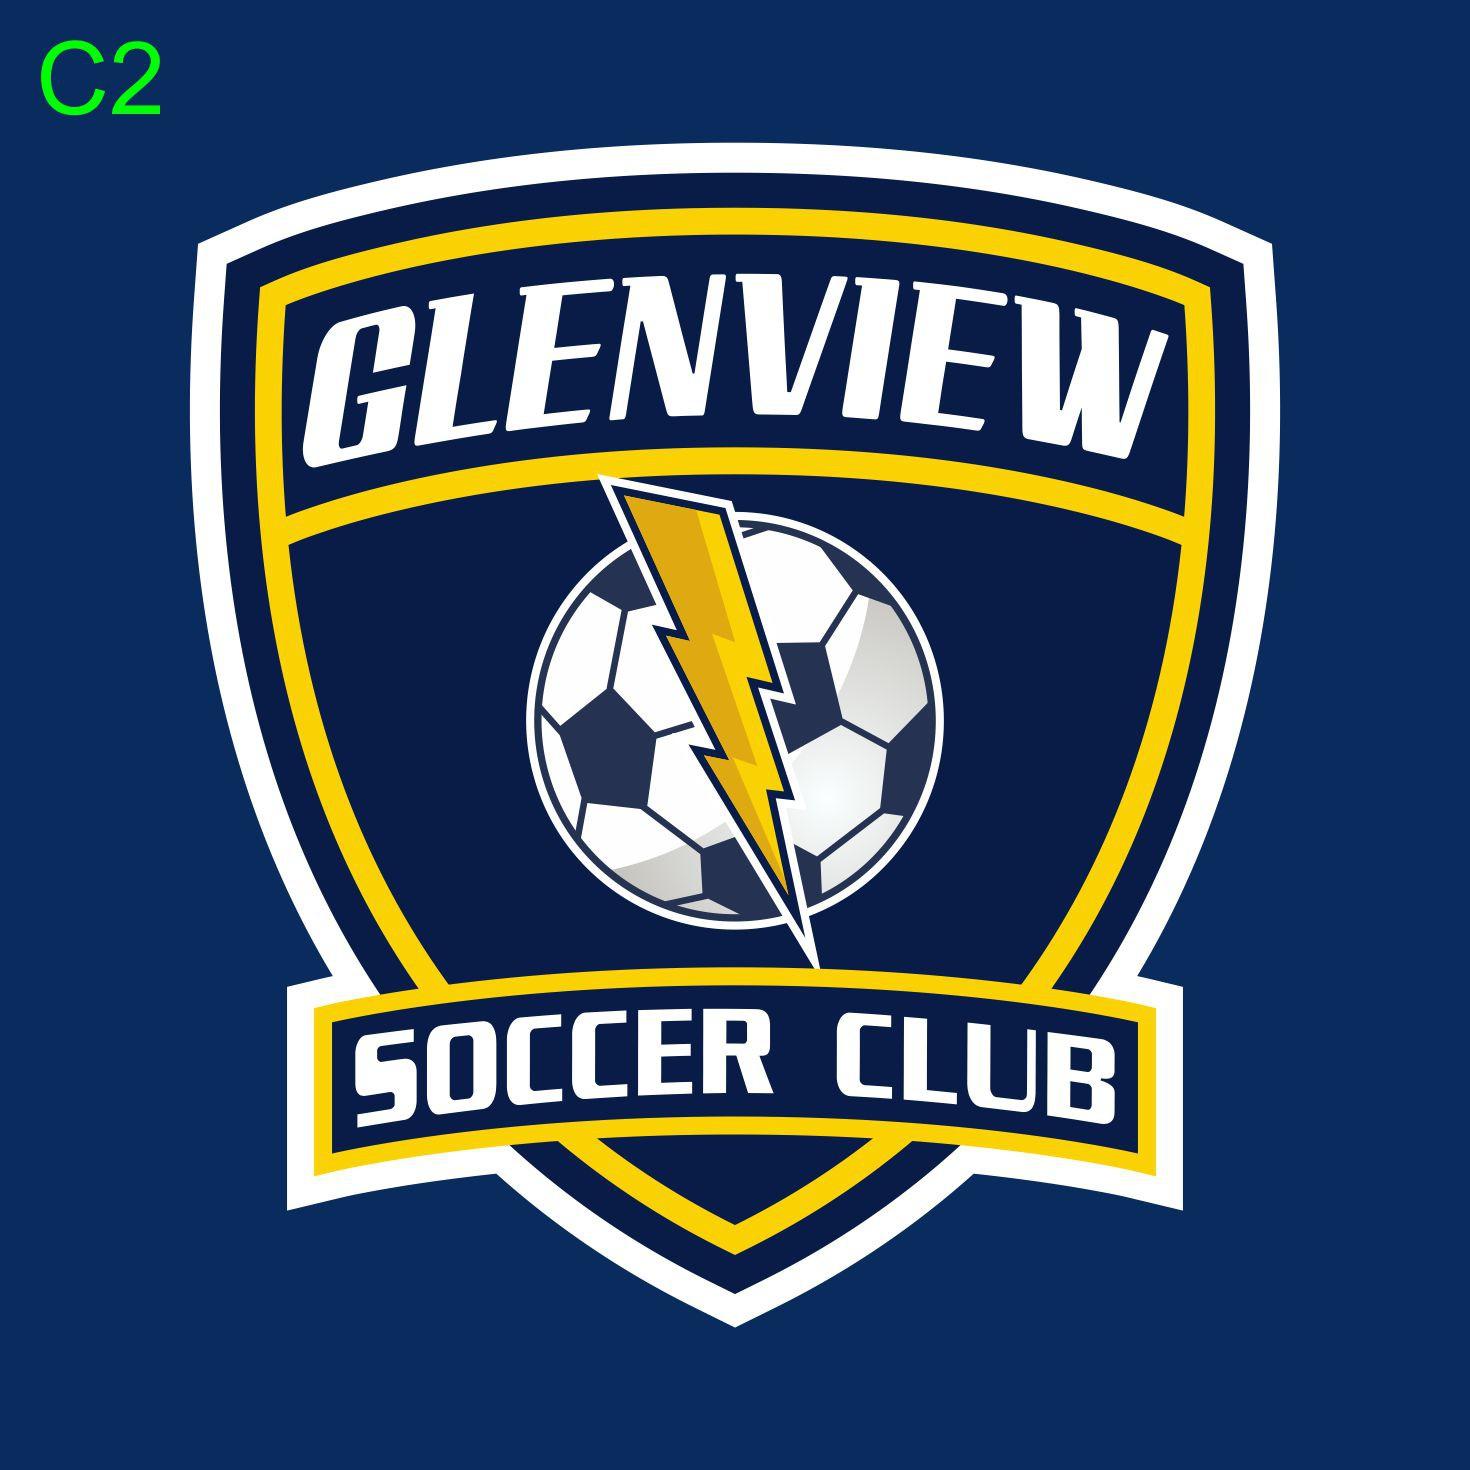 logo for Glenview Soccer Club